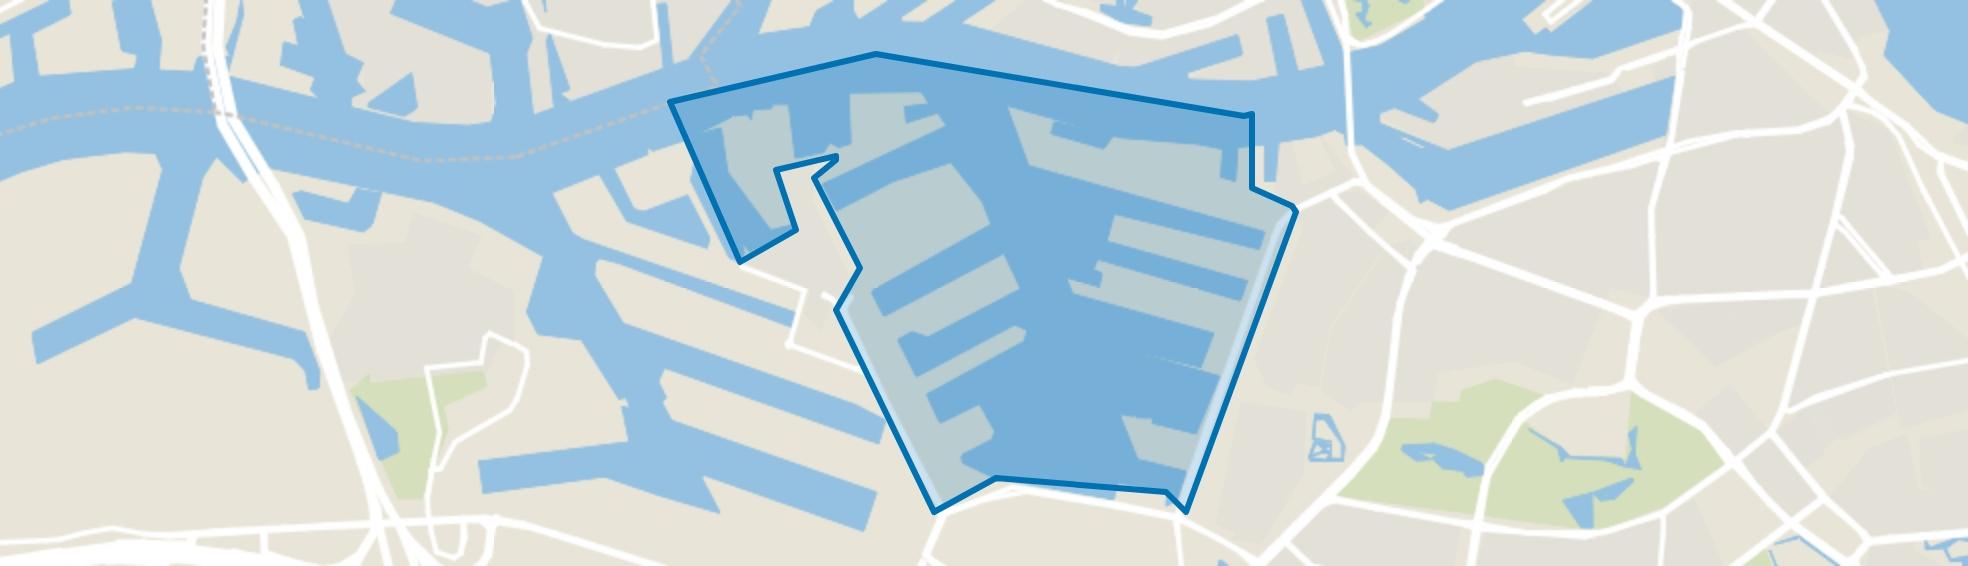 Waalhaven, Rotterdam map